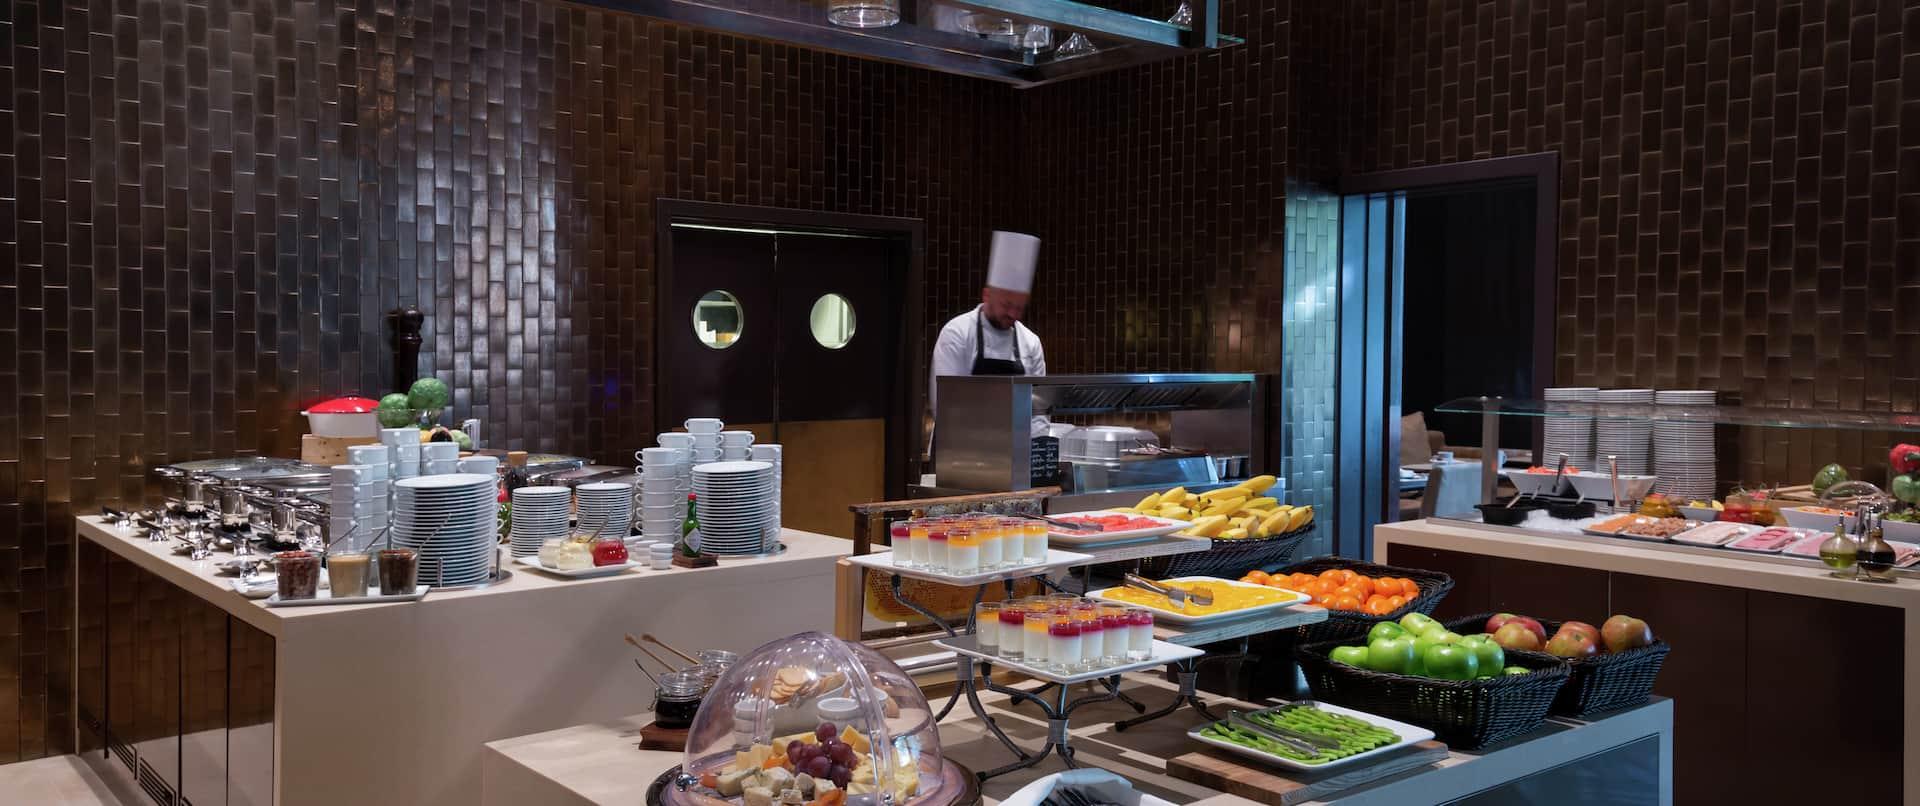 Breakfast Bar Area with Staff Member